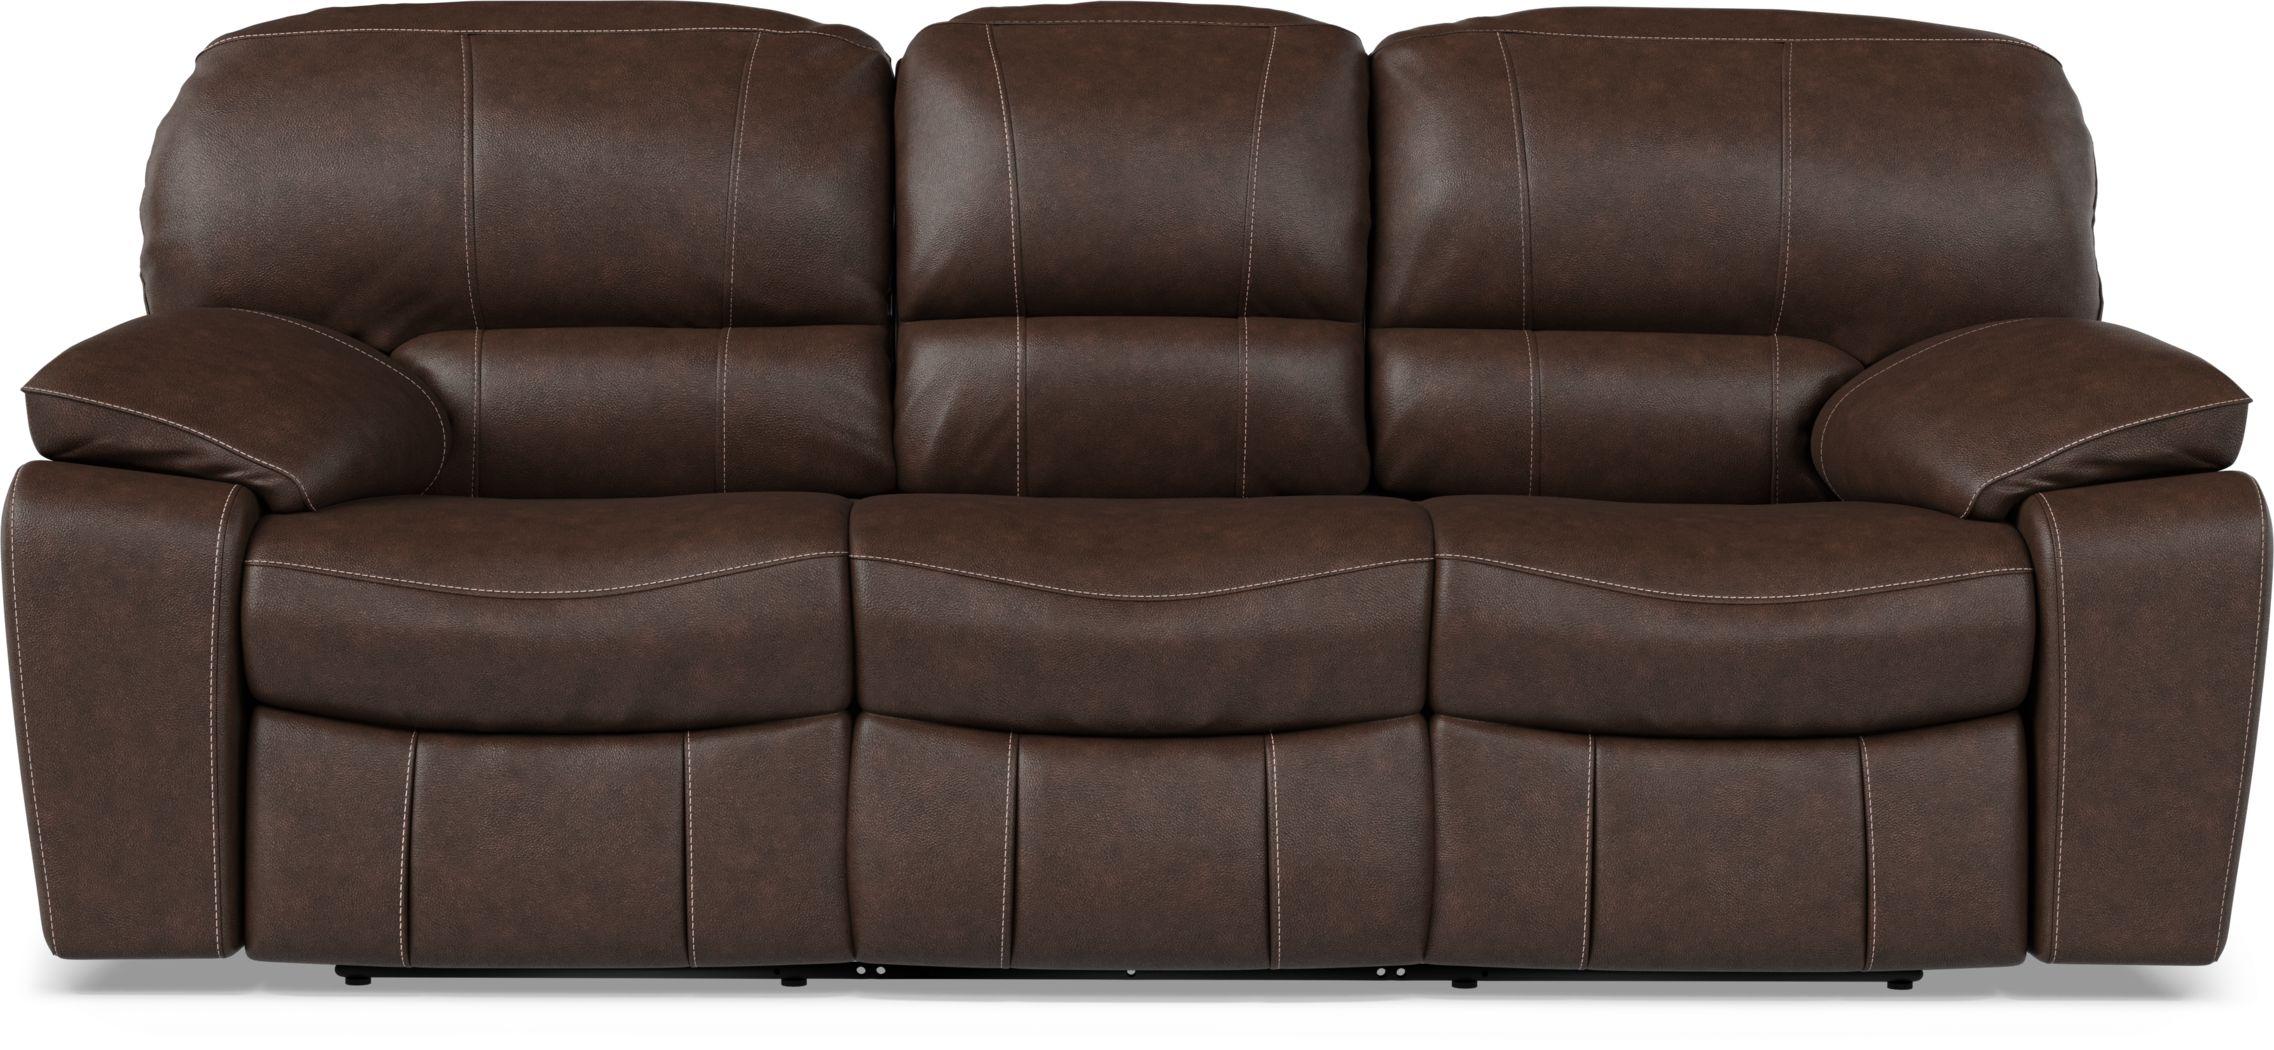 Cindy Crawford Home San Gabriel Brown Leather Reclining Sofa